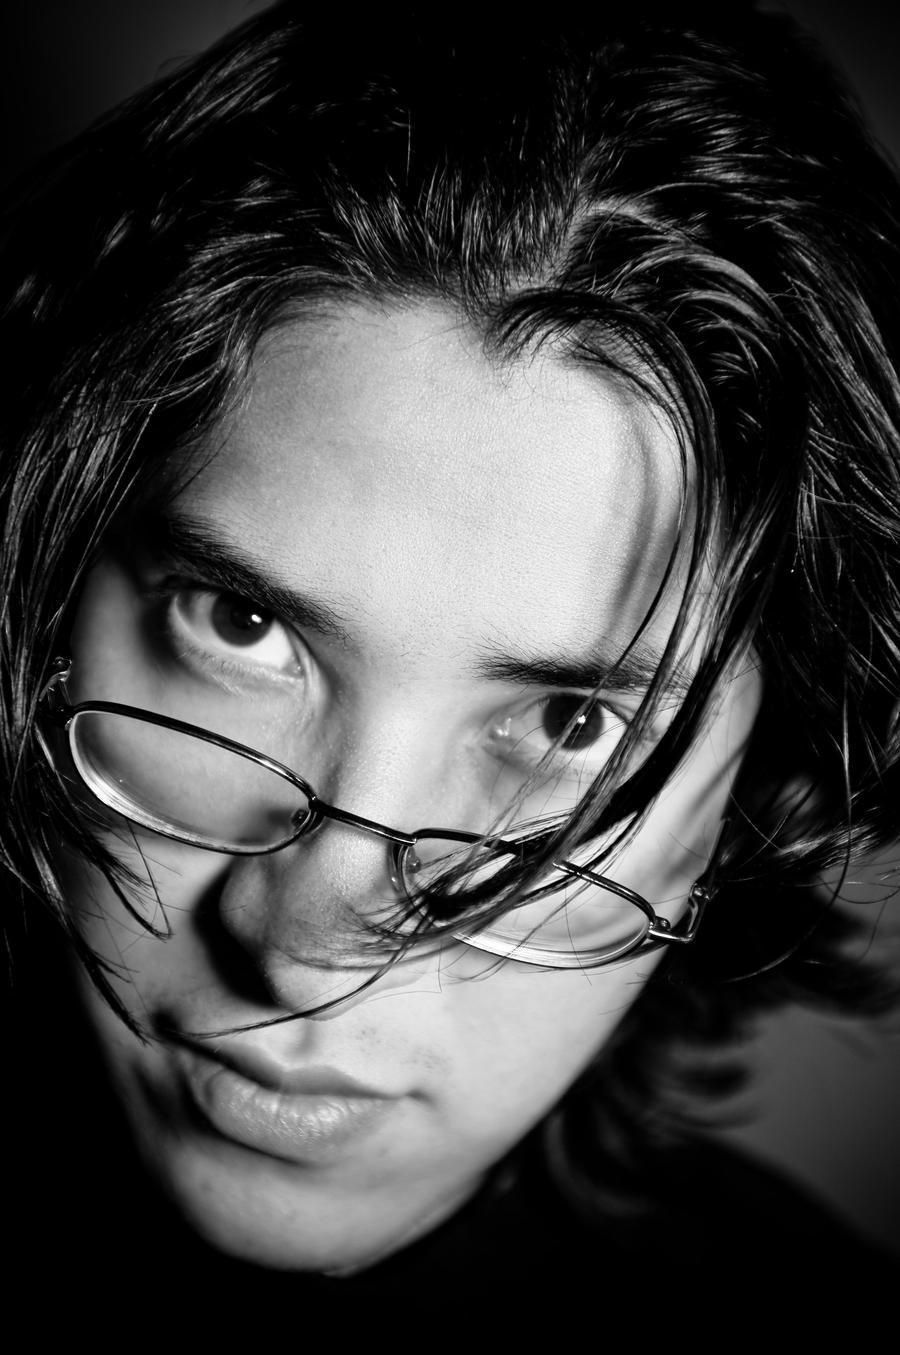 Vampirinocturne's Profile Picture